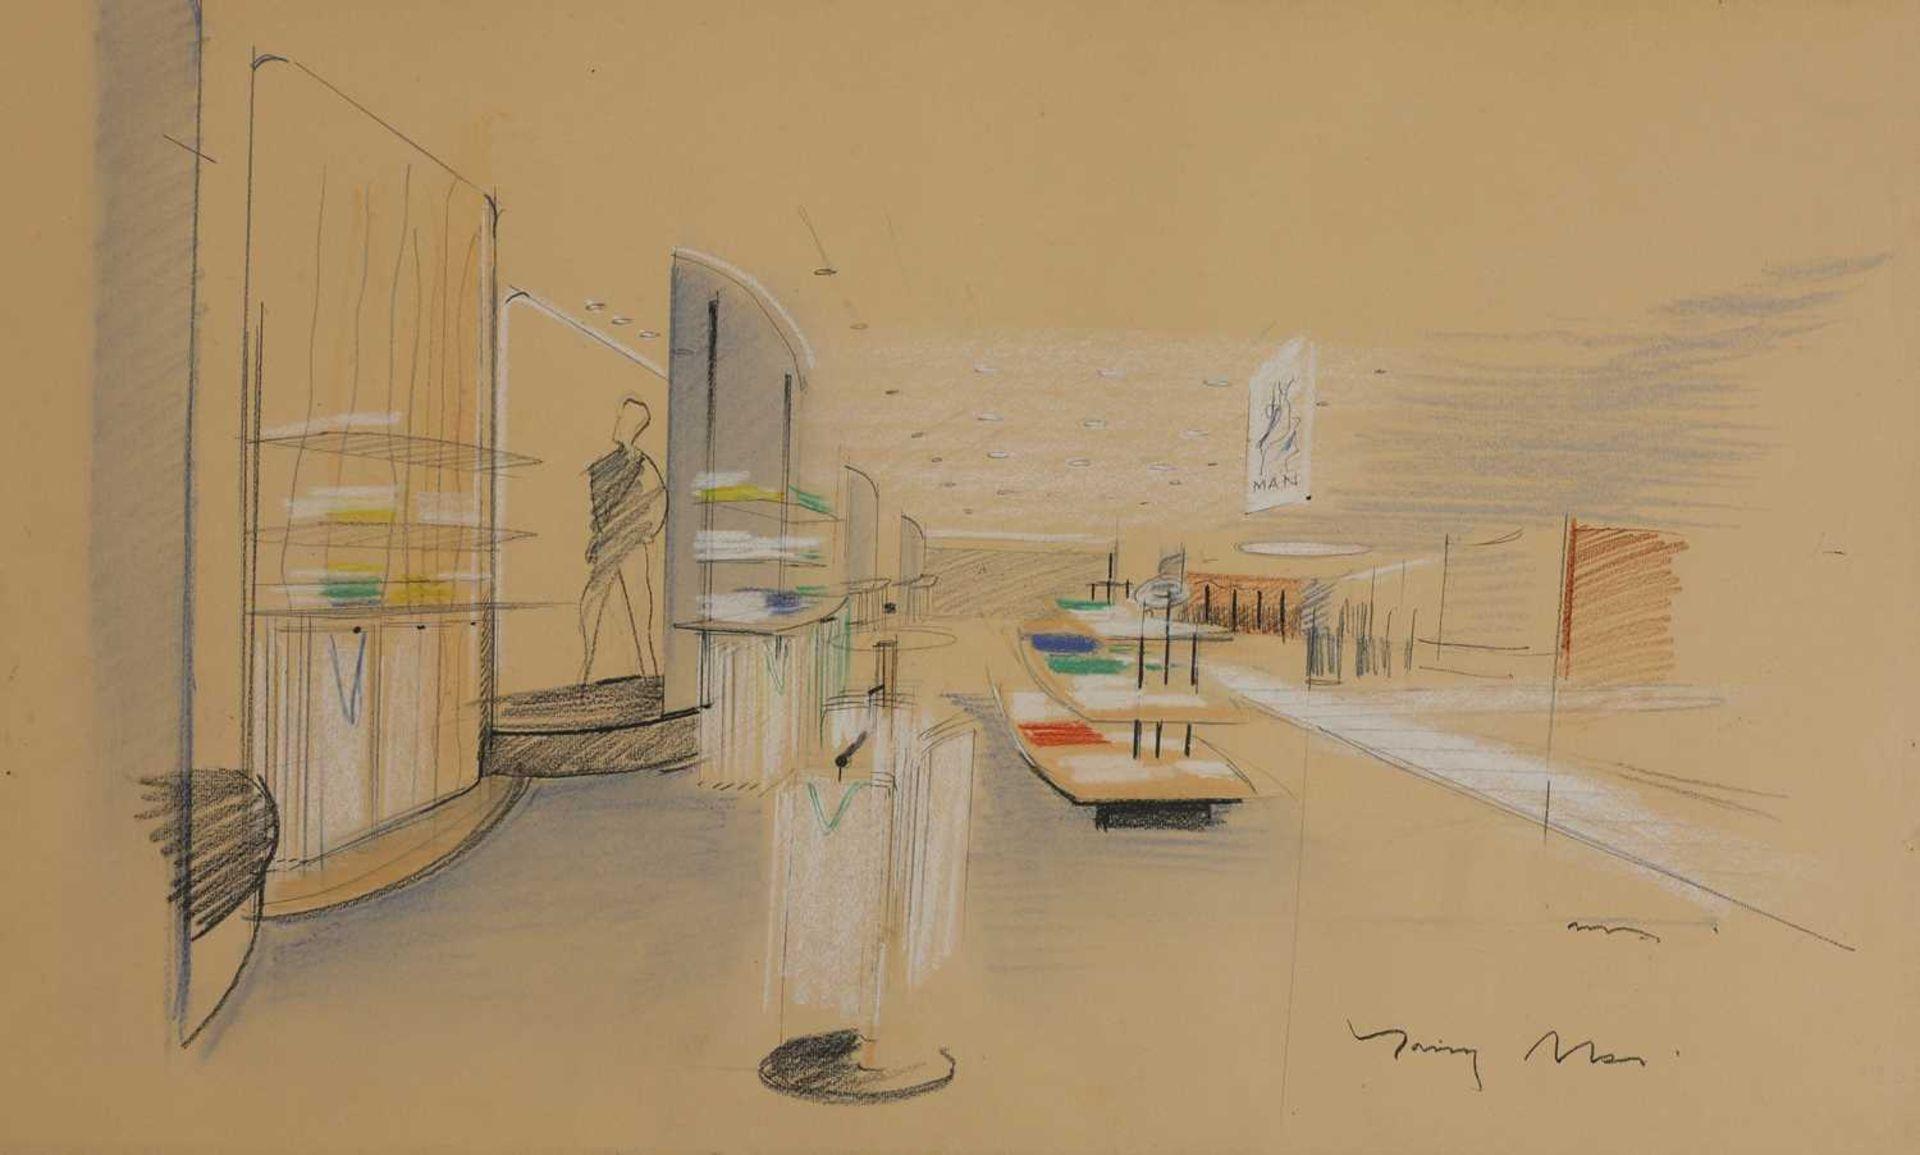 Maurice Broughton Associates, - Image 7 of 10